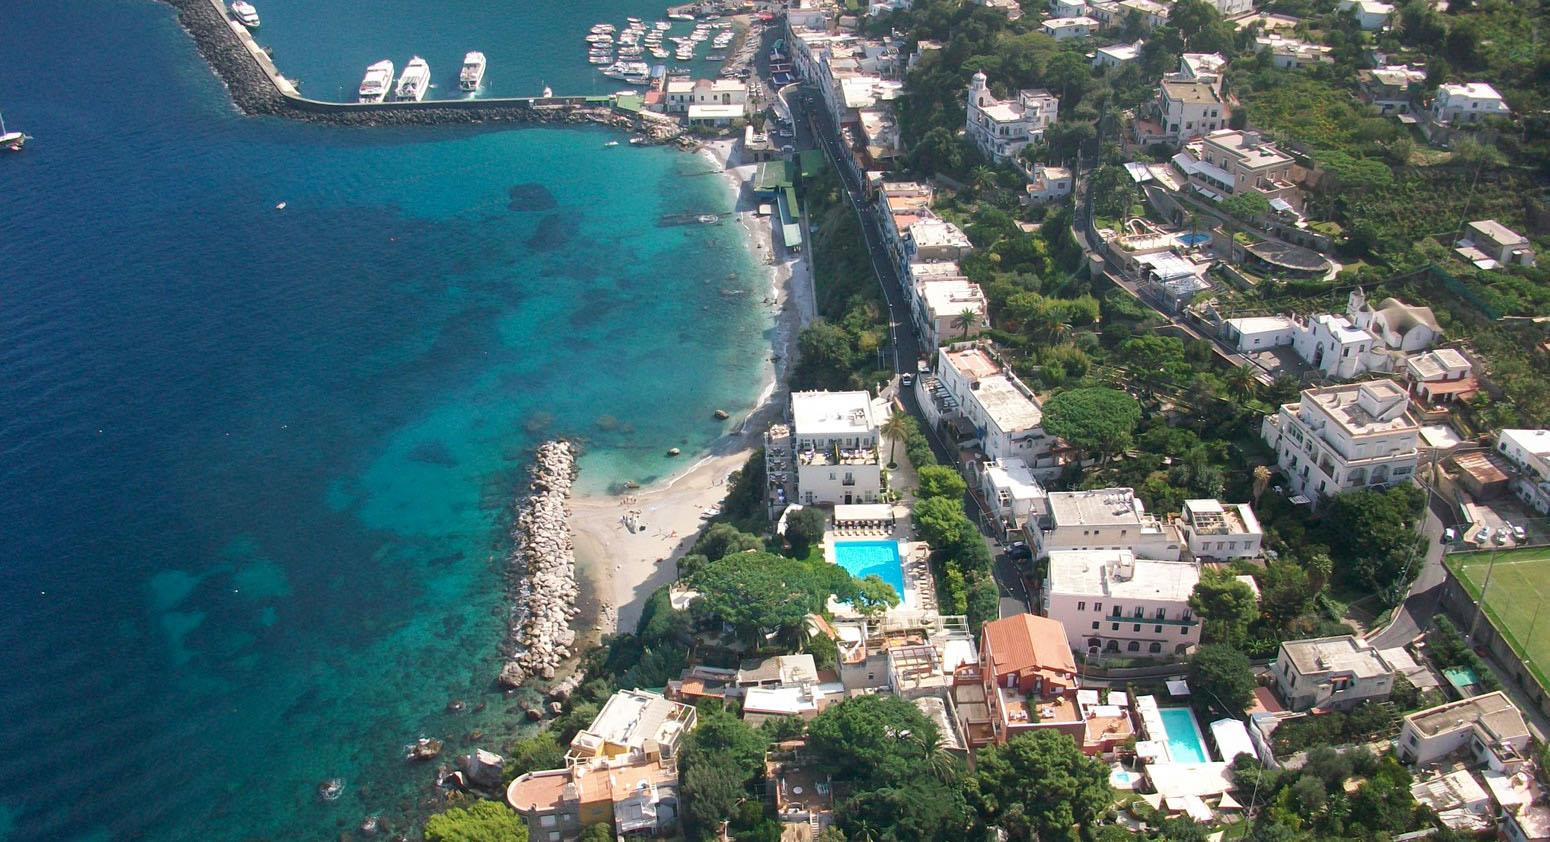 J K Place Capri Hotel Elegant Seaside Decor Idesignarch